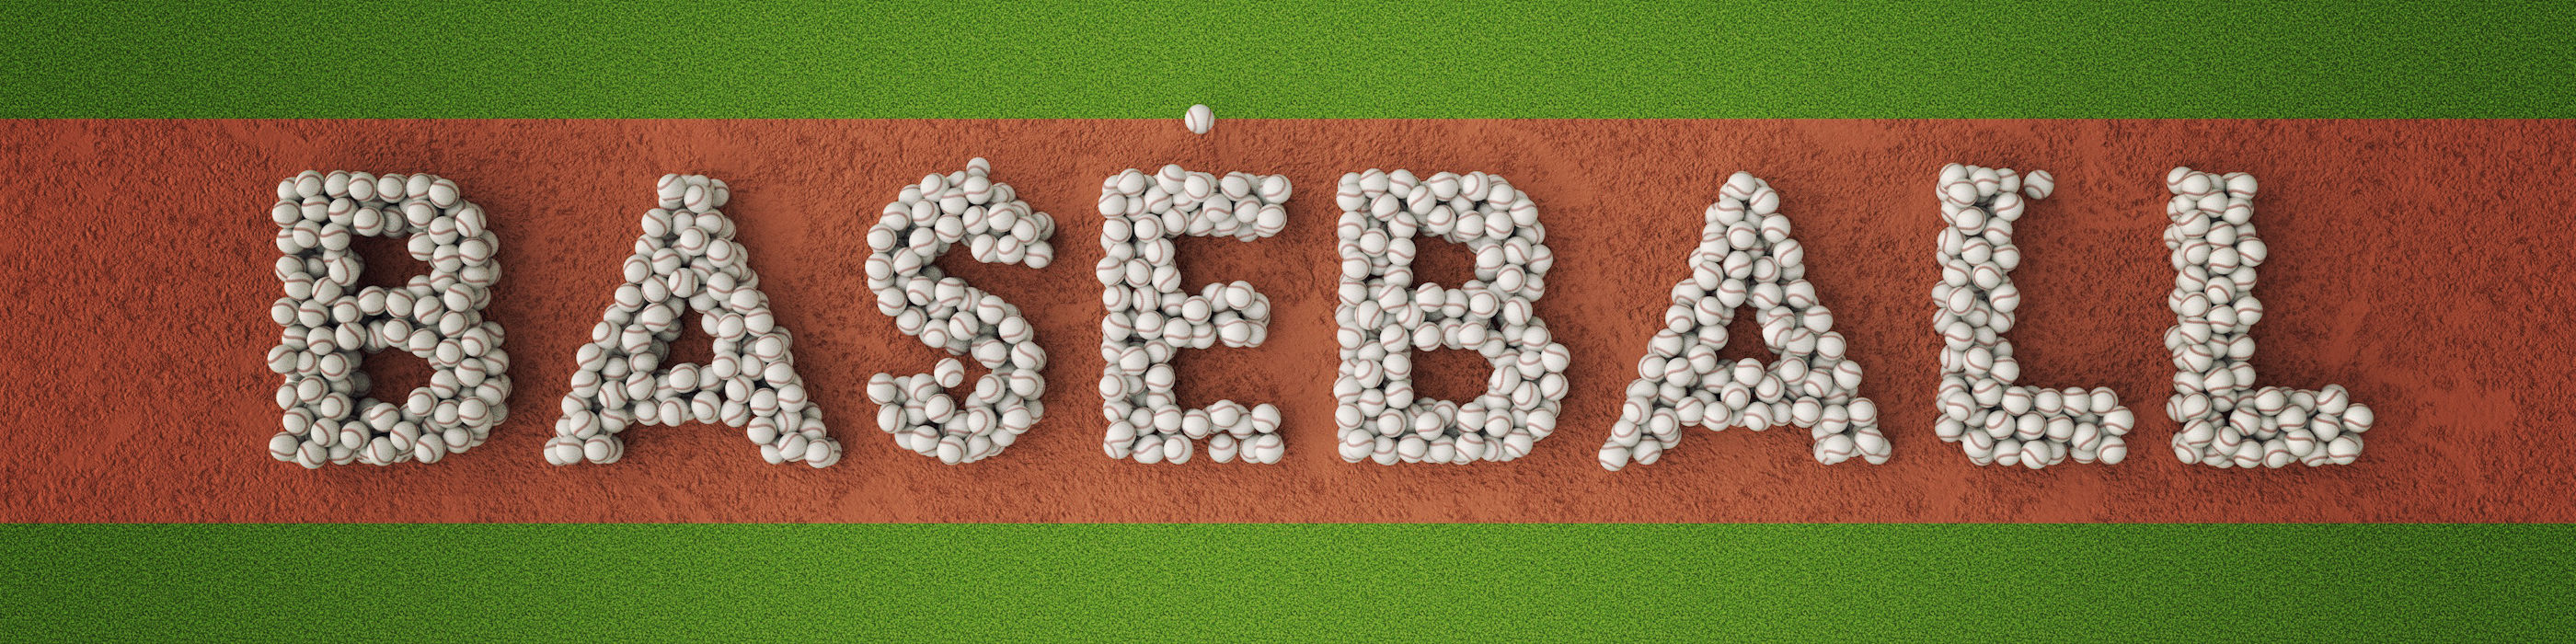 baseball-themed-birthday-ideas